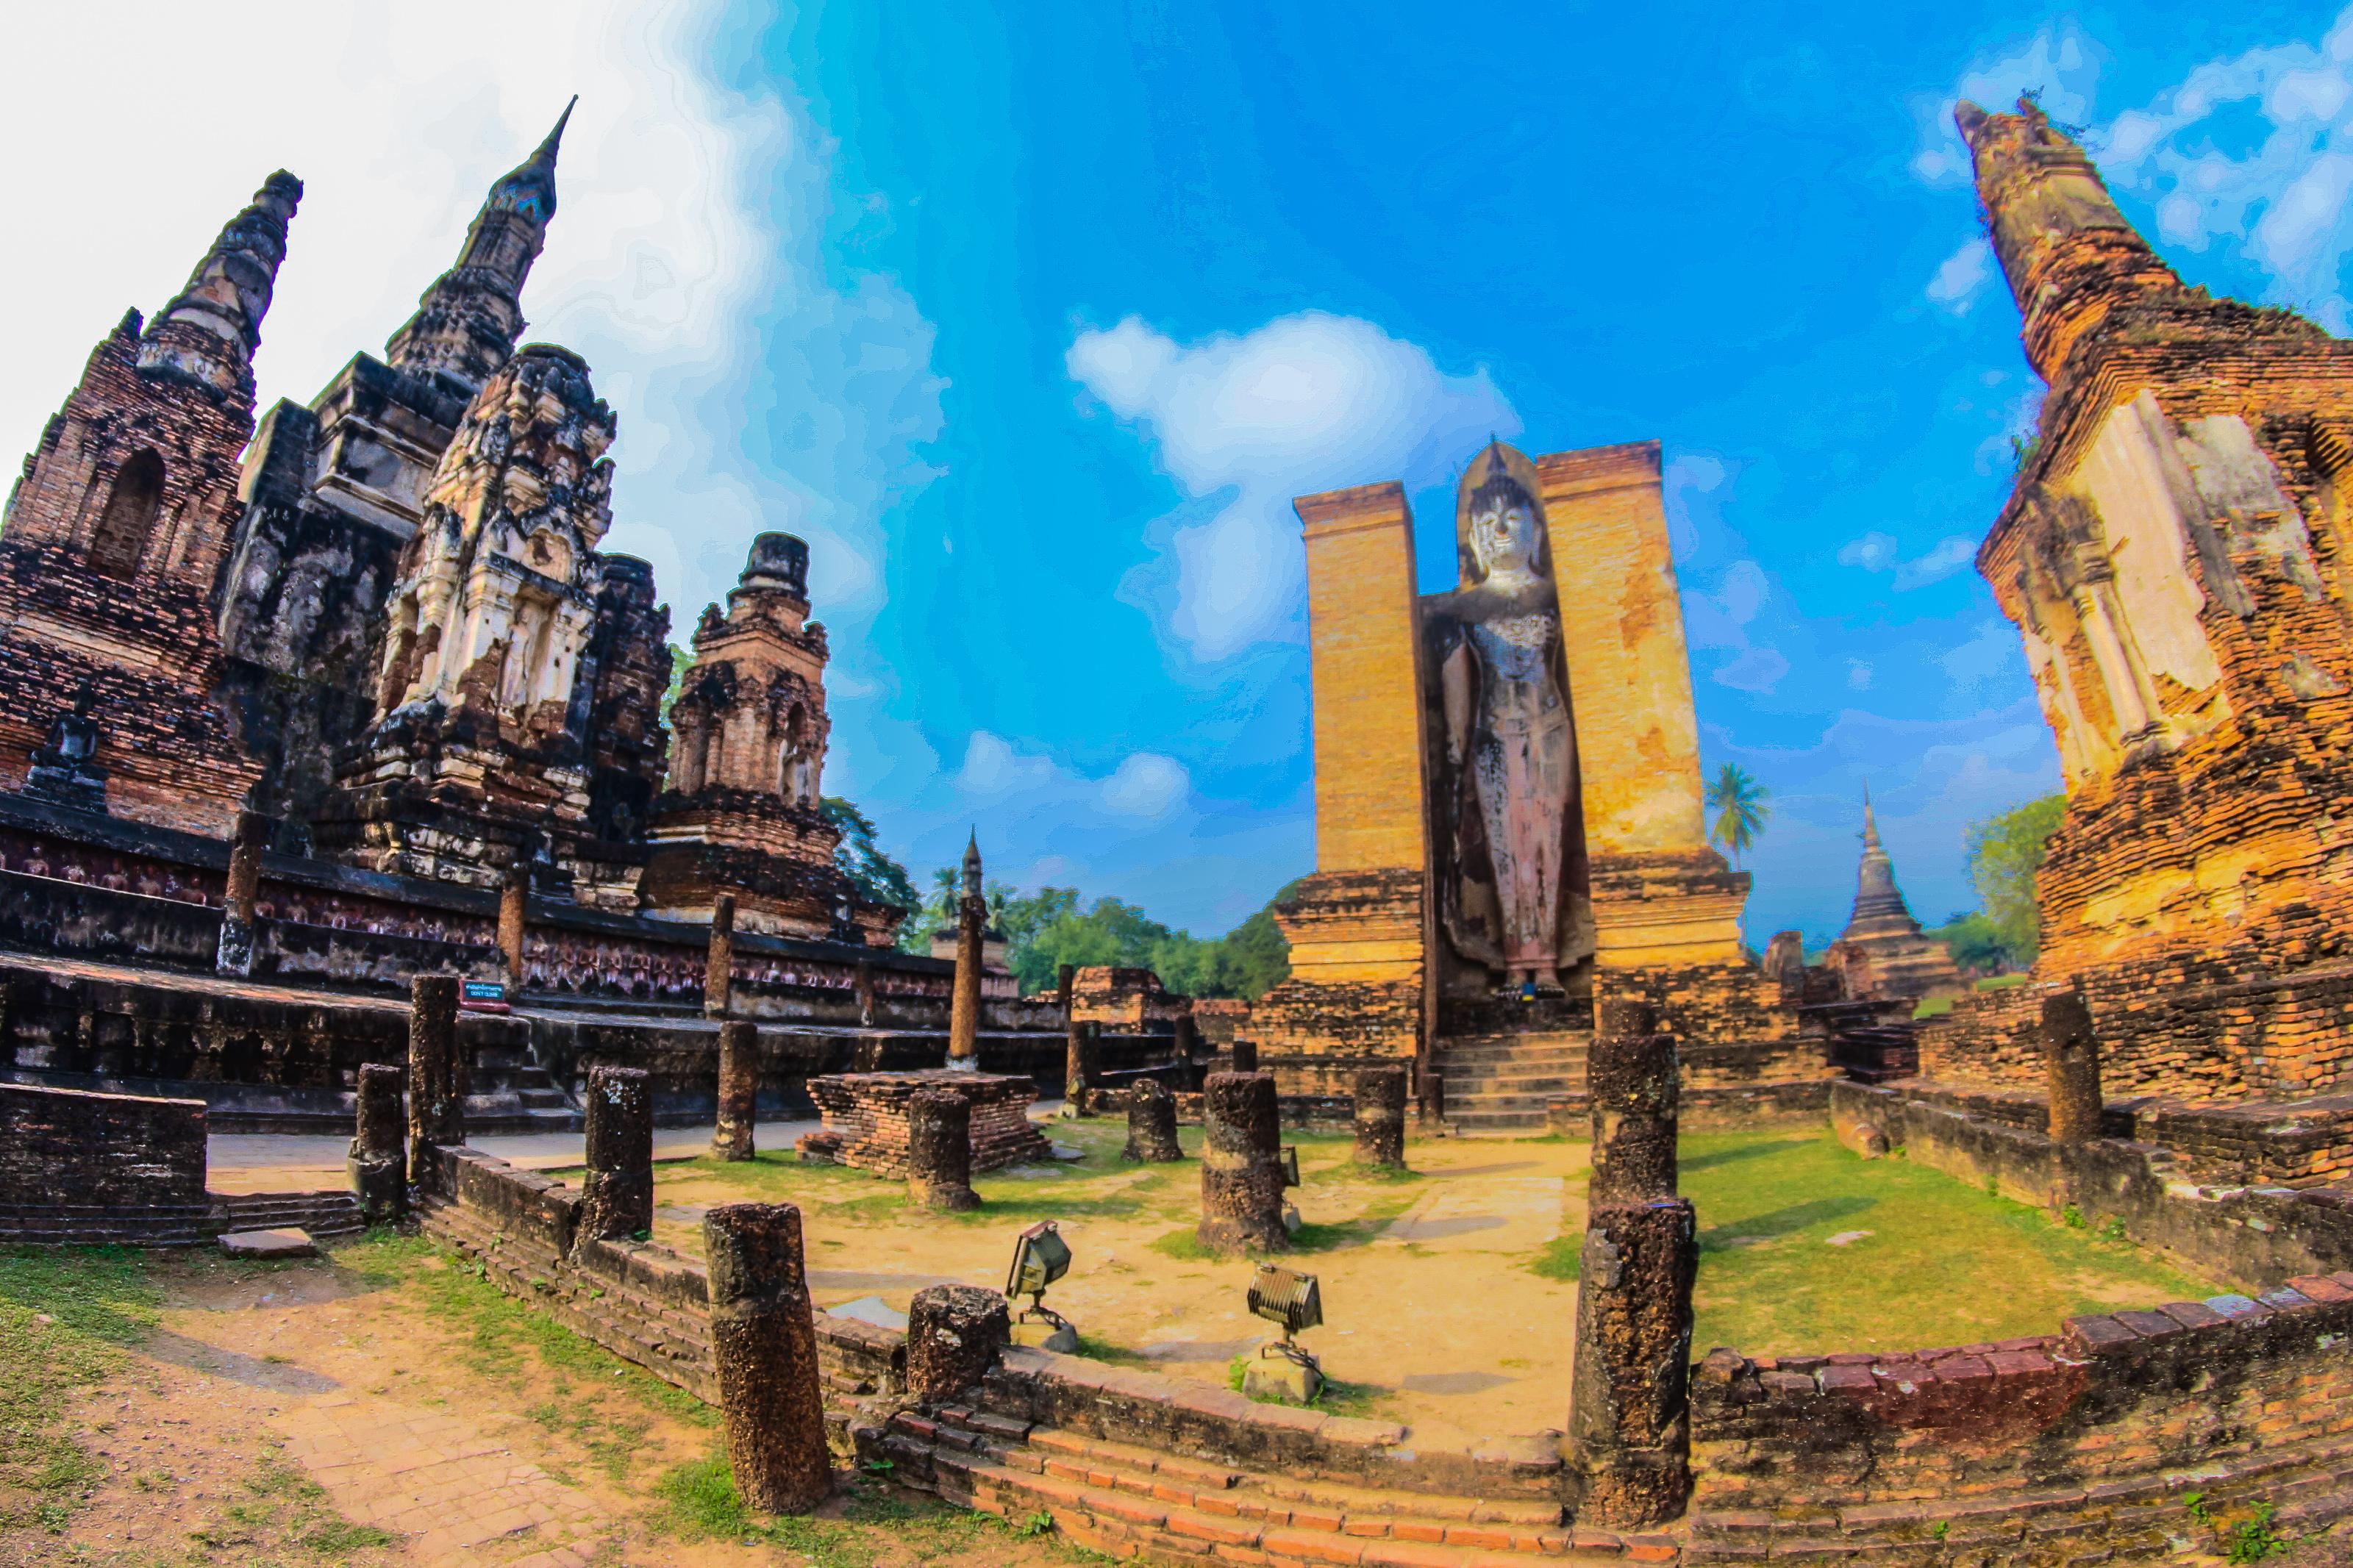 Free Images : archeology, art, asia, buddha, buddhism